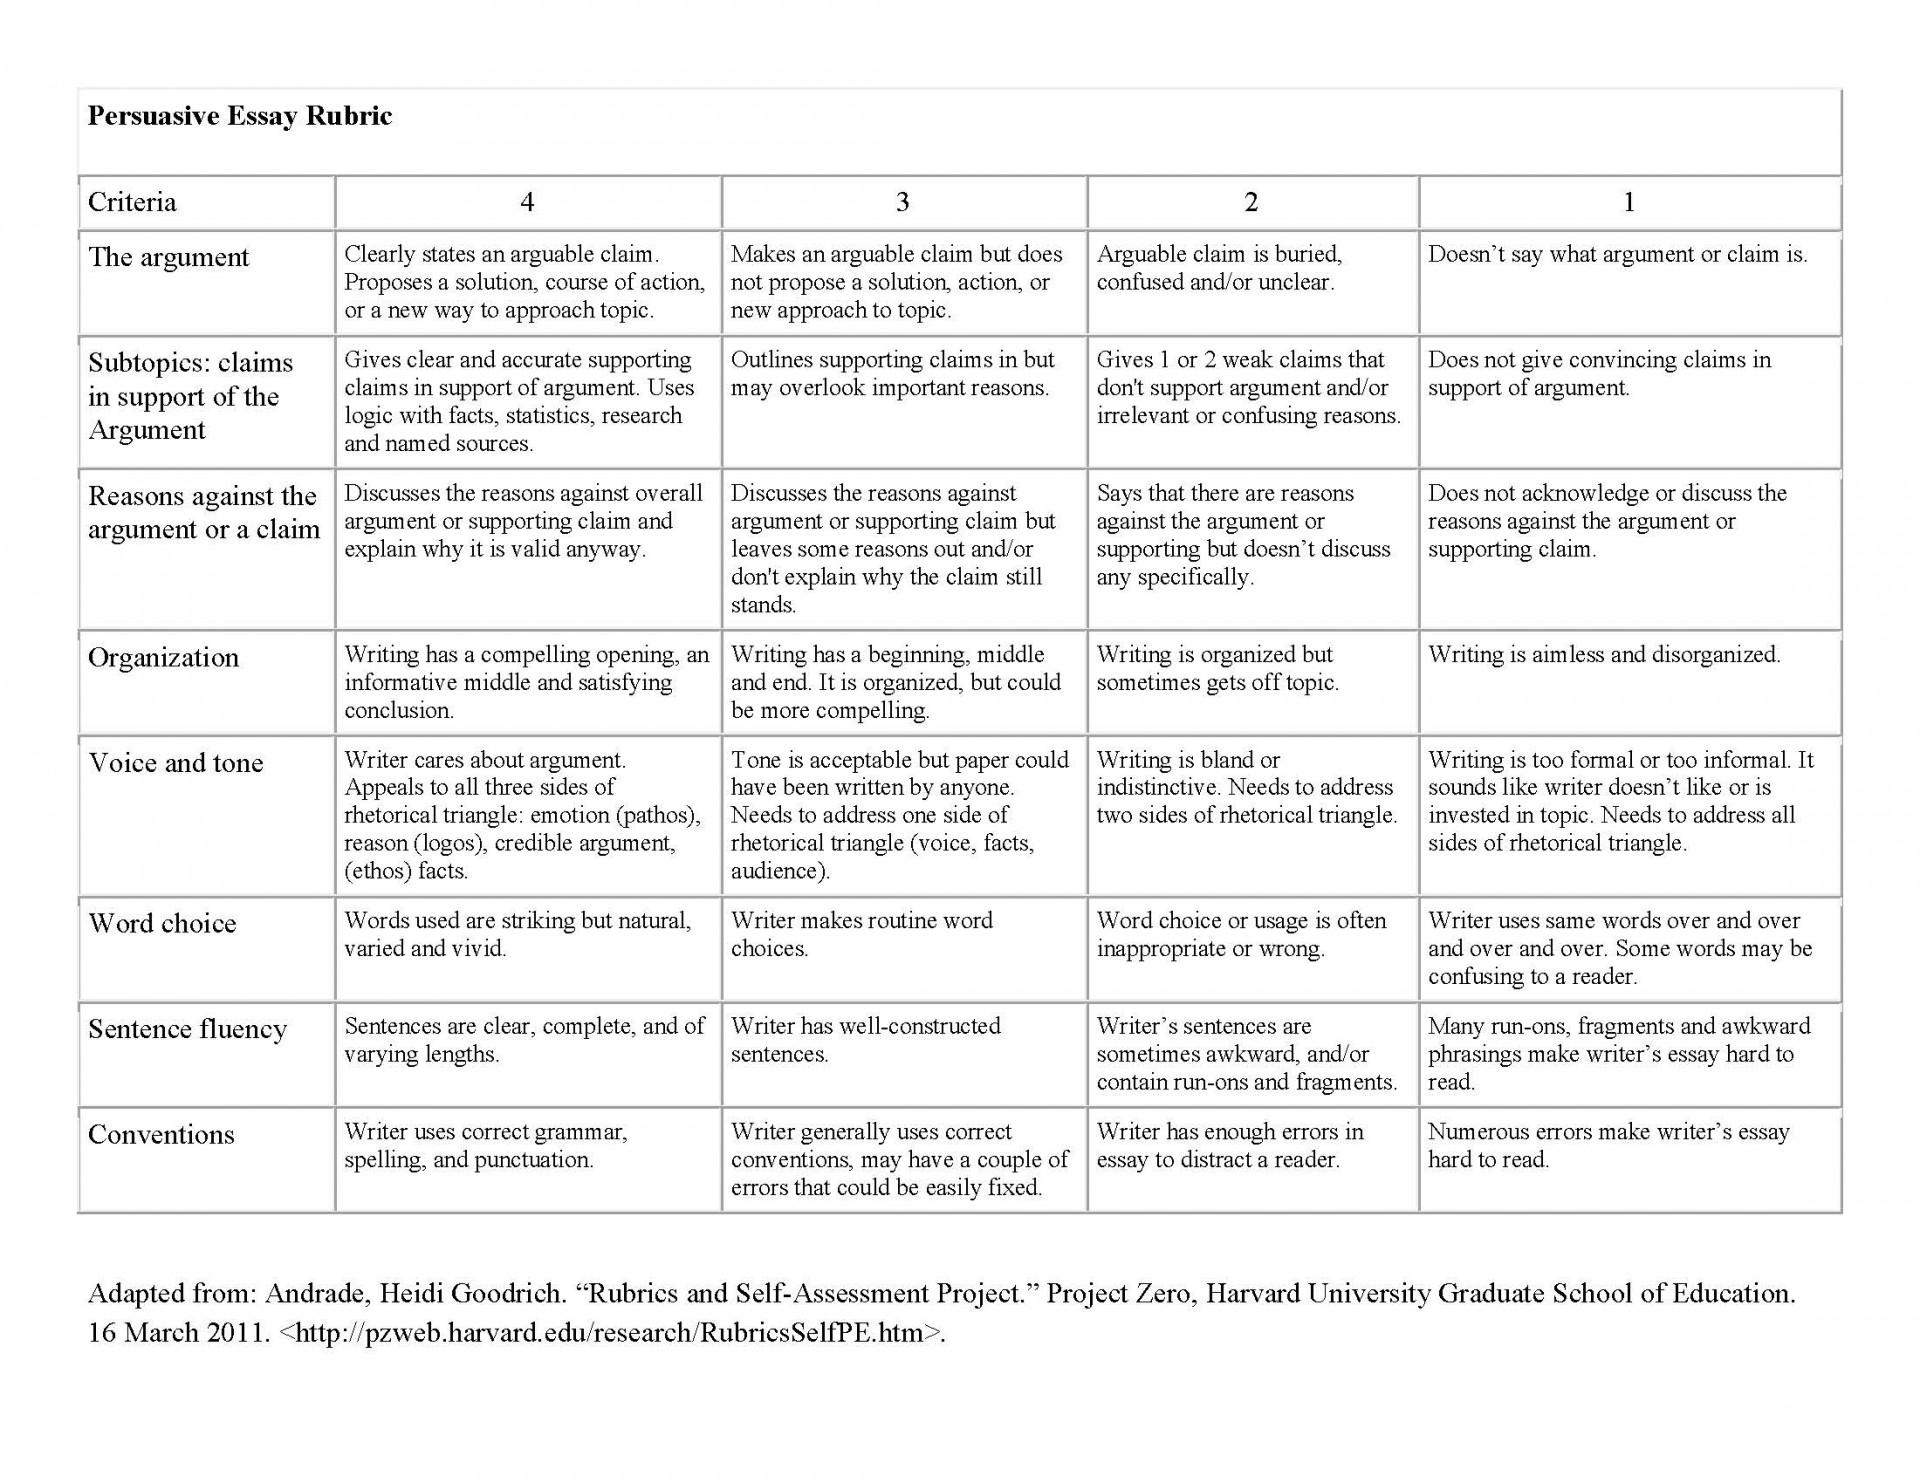 008 Essay Example Argumentative Rubric Handout Persuasive Surprising Grade 7 10th 1920